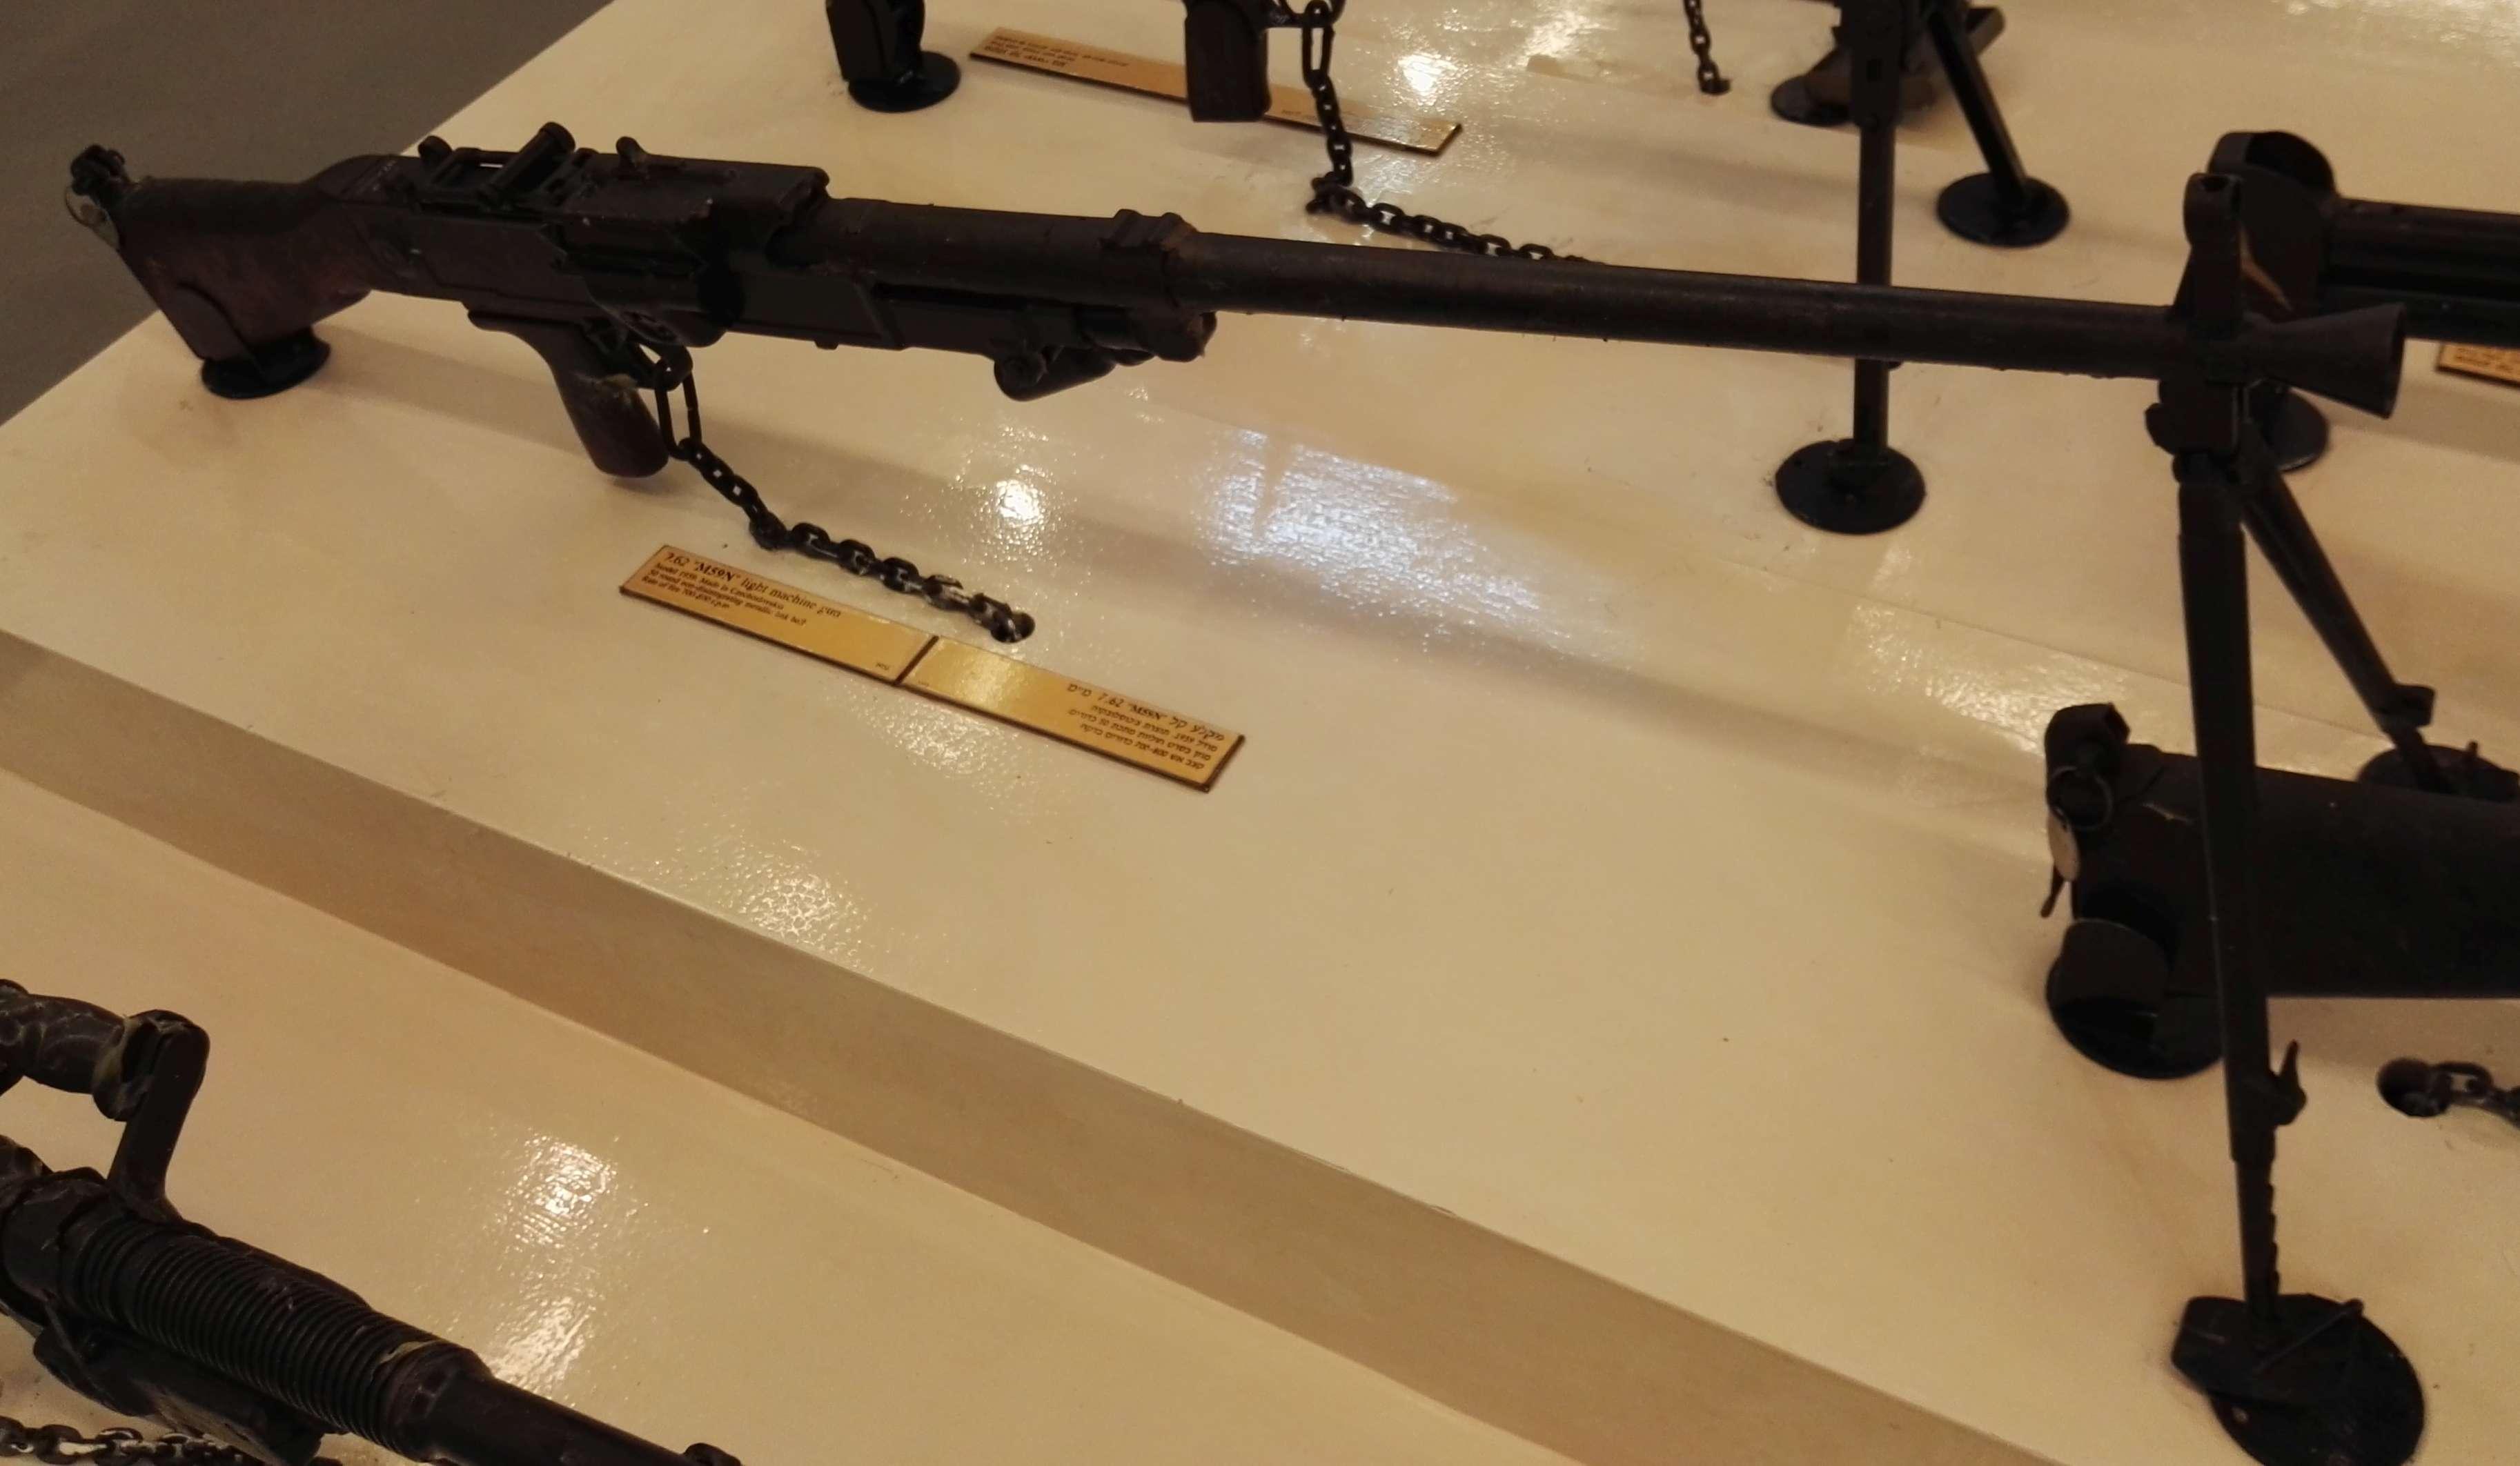 File:VZ59N-machine-gun-batey-haosef-1 jpg - Wikimedia Commons